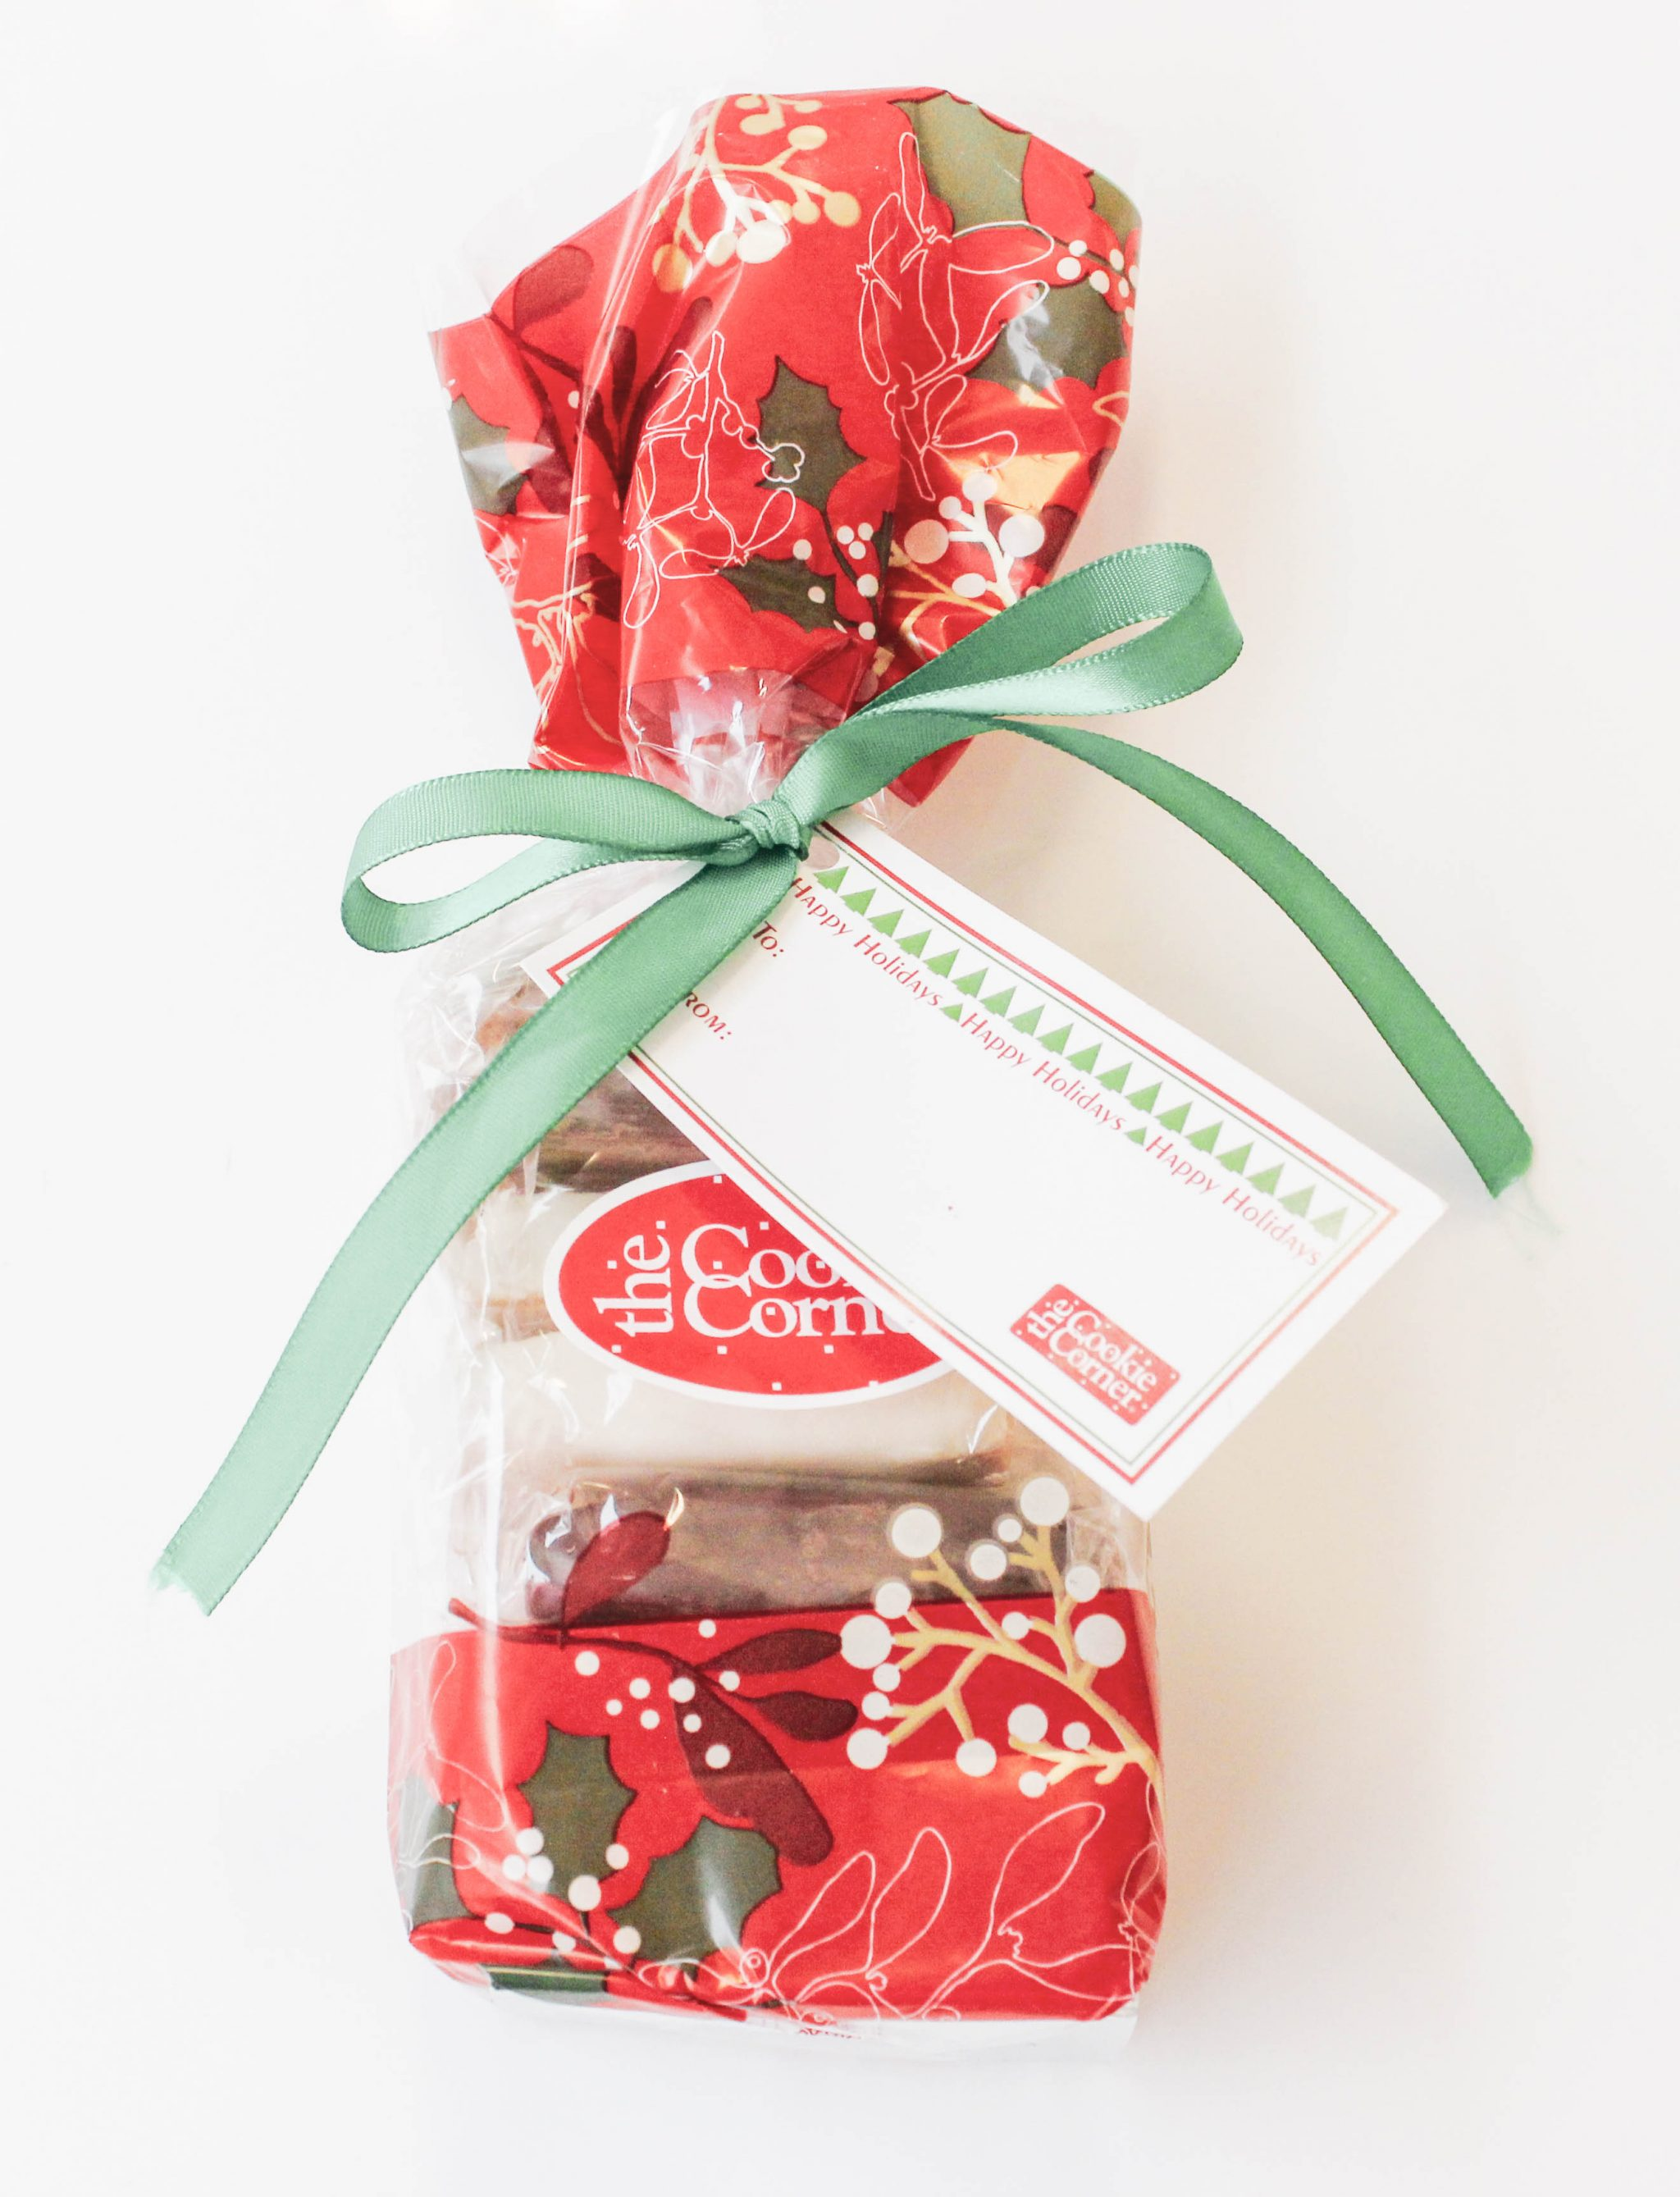 ¡Muchas gracias! 美味しいクリスマスのチョコ菓子・1🍫